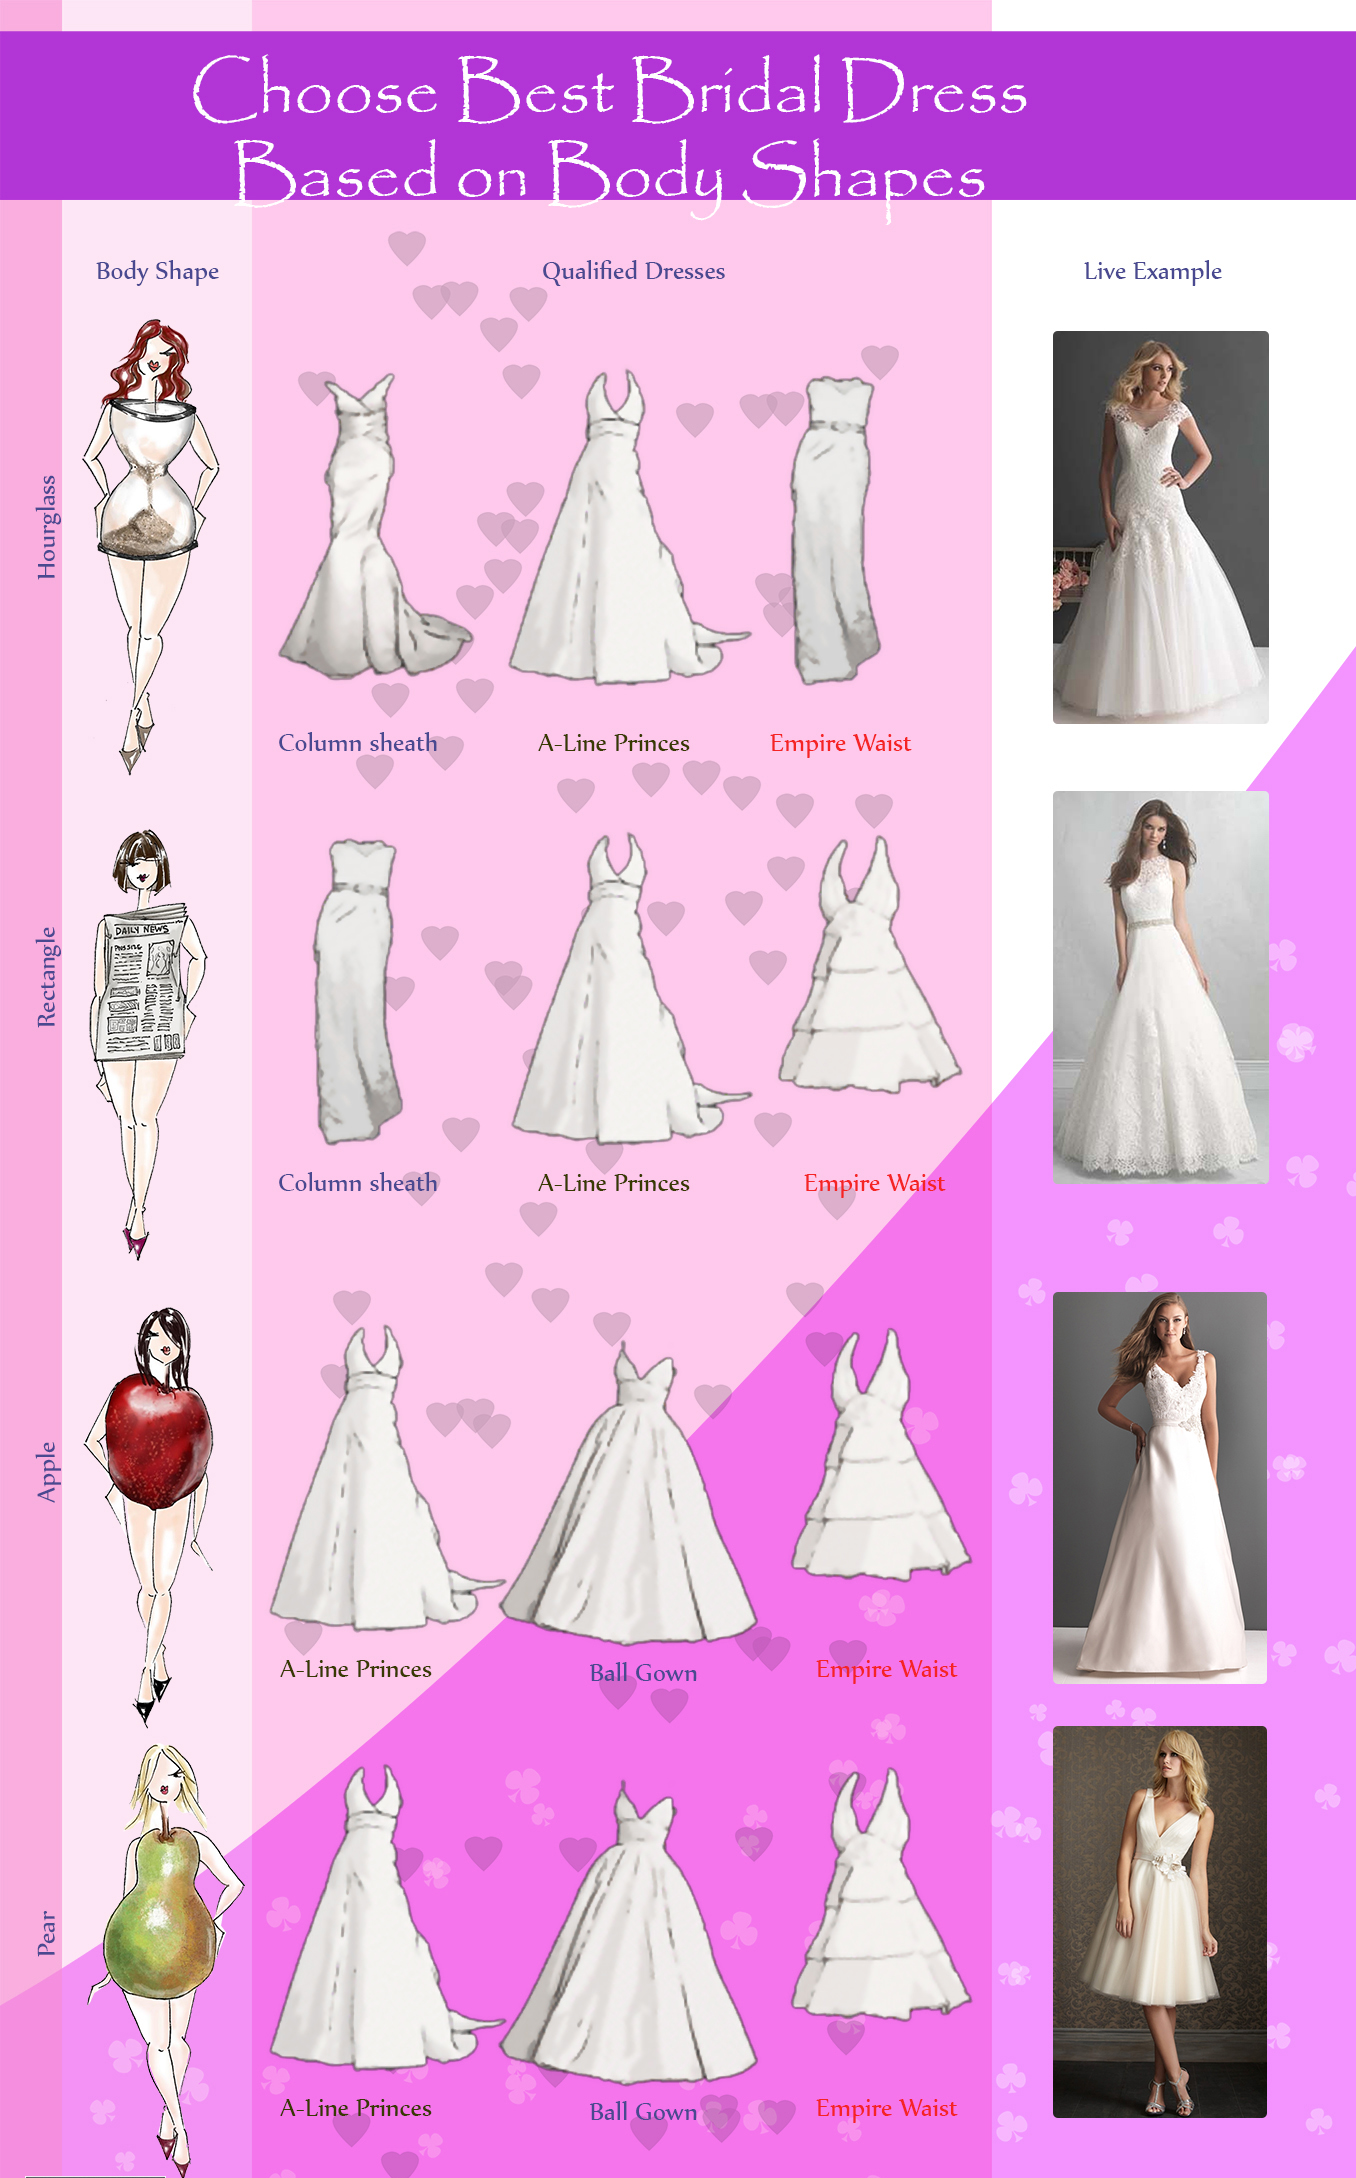 Choose Best Bridal Dress based on Body Shapes 2019